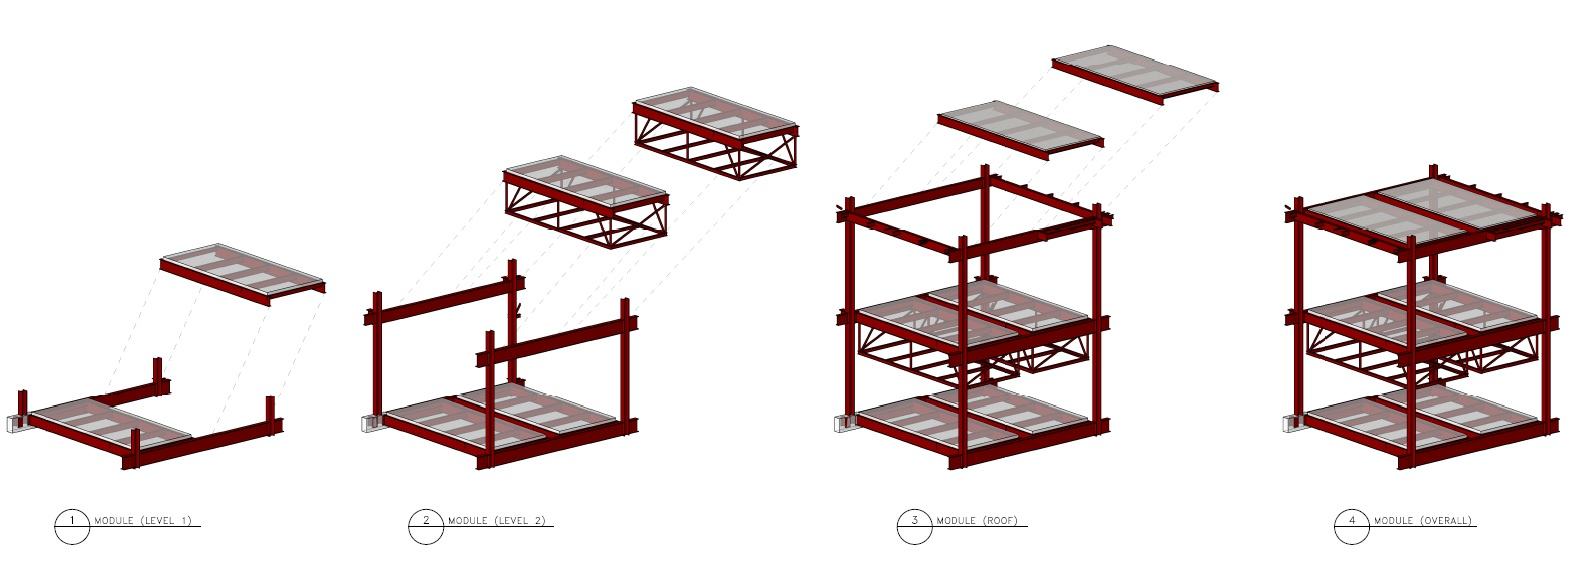 1596x568 Whitehorse General Hospital Expansion Utilizes Modular Steel